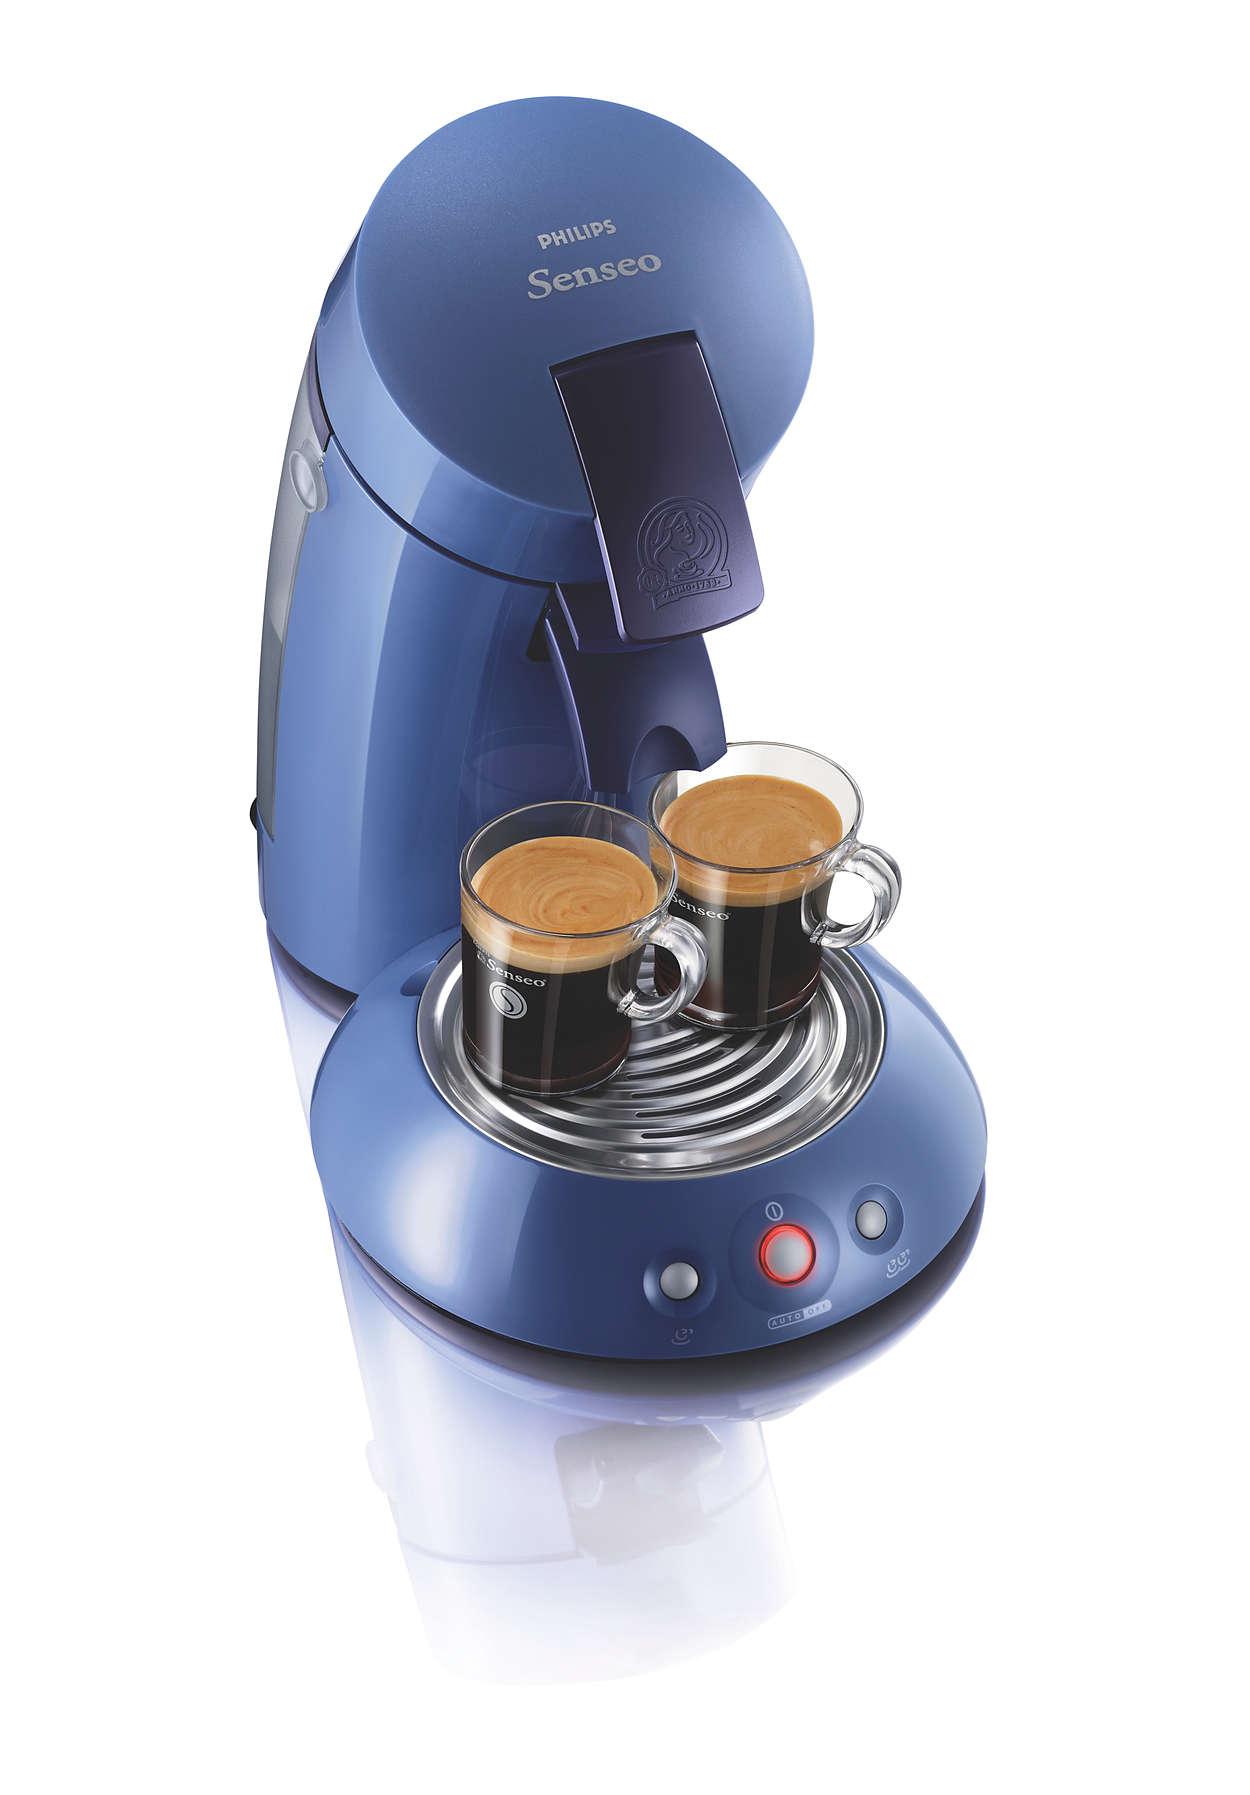 Philips Senseo HD7982/70 XL Wassertank für Kaffeemaschinen Modelle HD7810 – gdvk.de